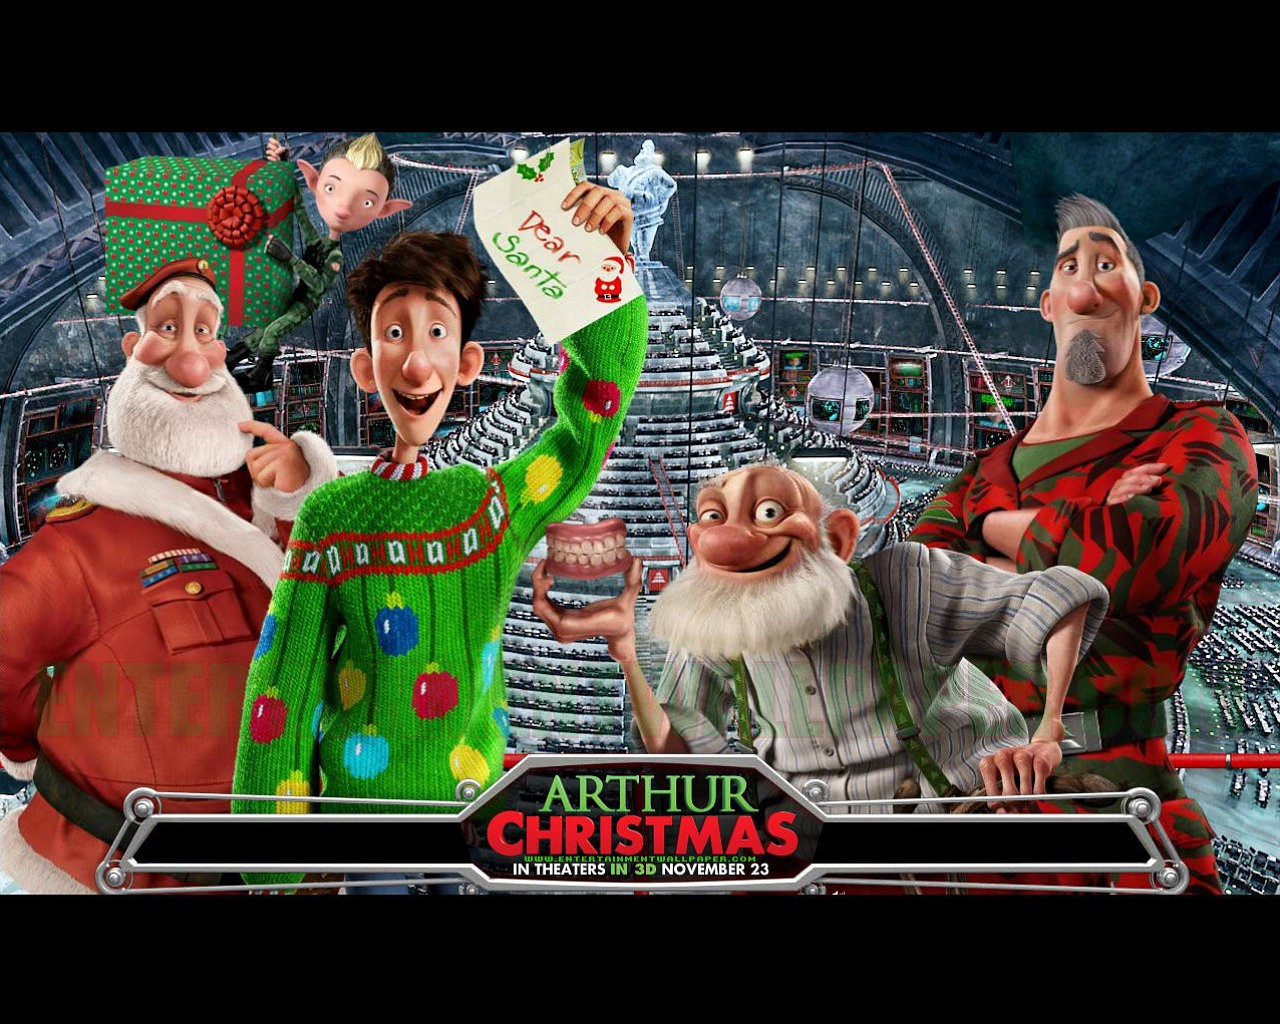 Best 46 Arthur Christmas Wallpaper on HipWallpaper Christmas 1280x1024